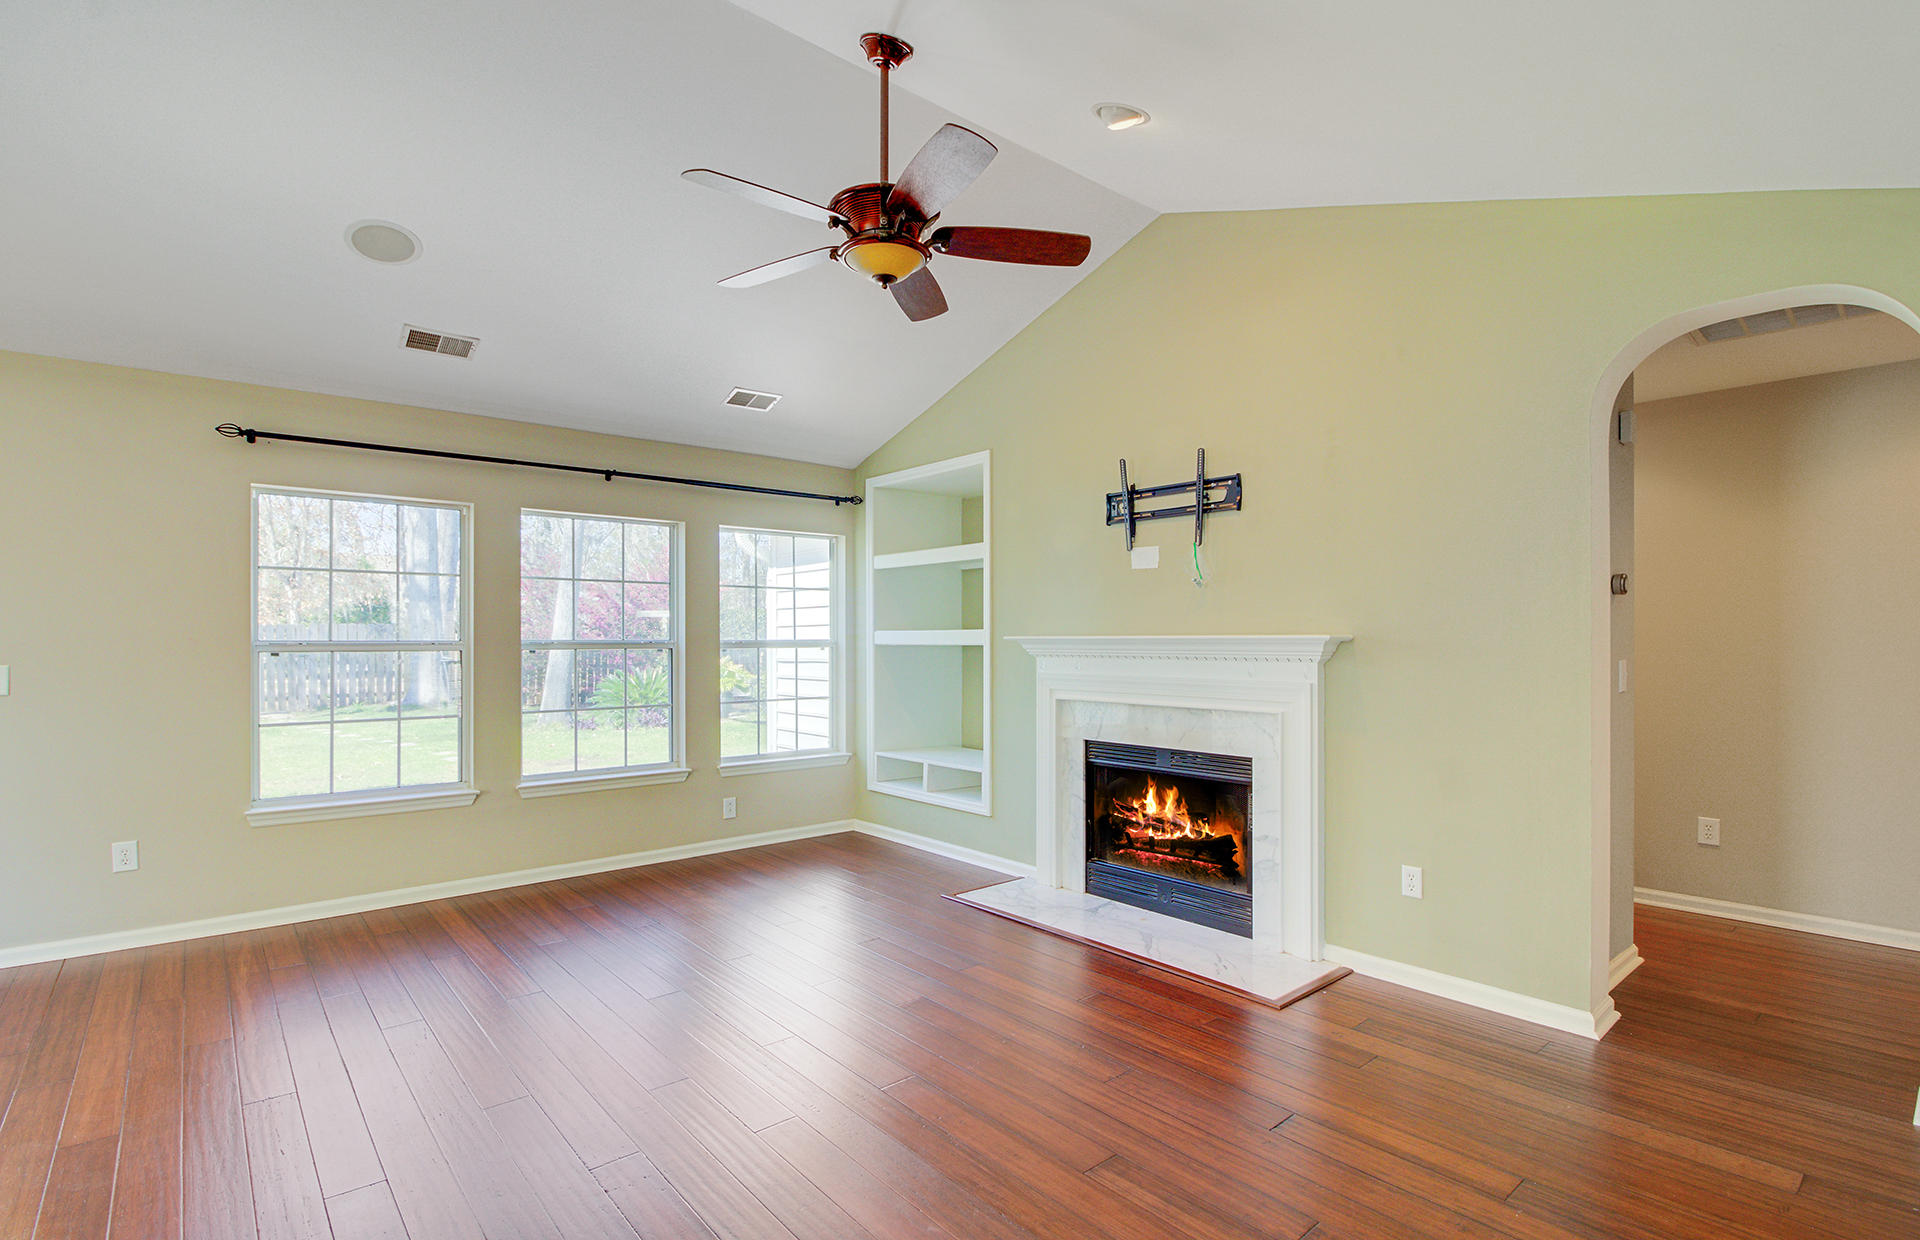 Grand Oaks Plantation Homes For Sale - 789 Bent Hickory, Charleston, SC - 5